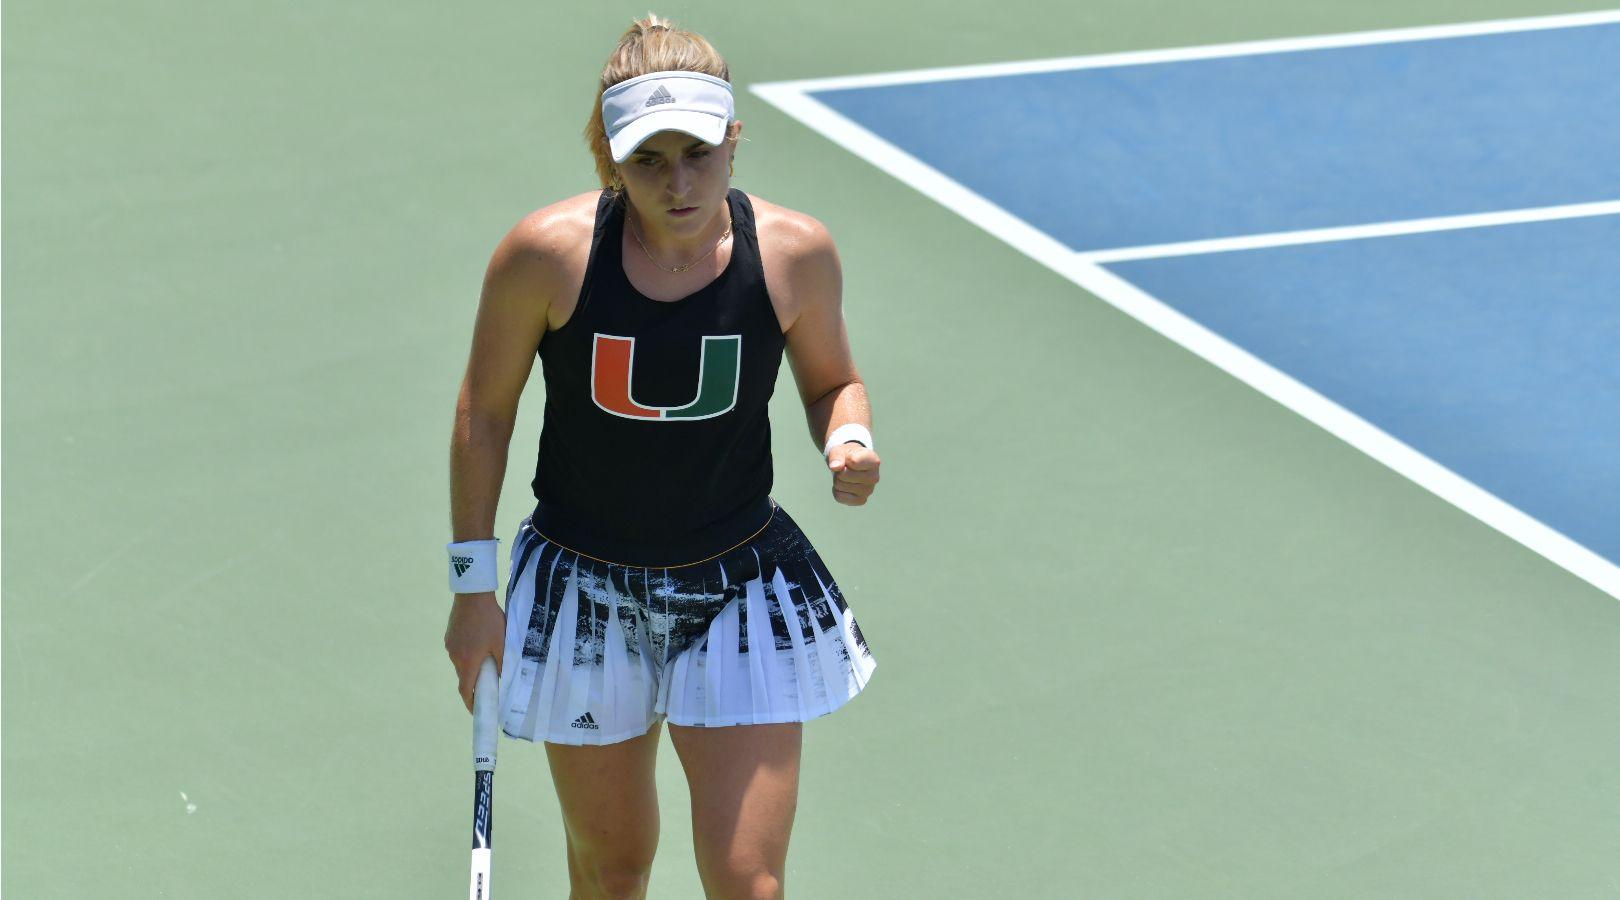 Perez-Somarriba Finishes No. 1 in ITA Singles Rankings